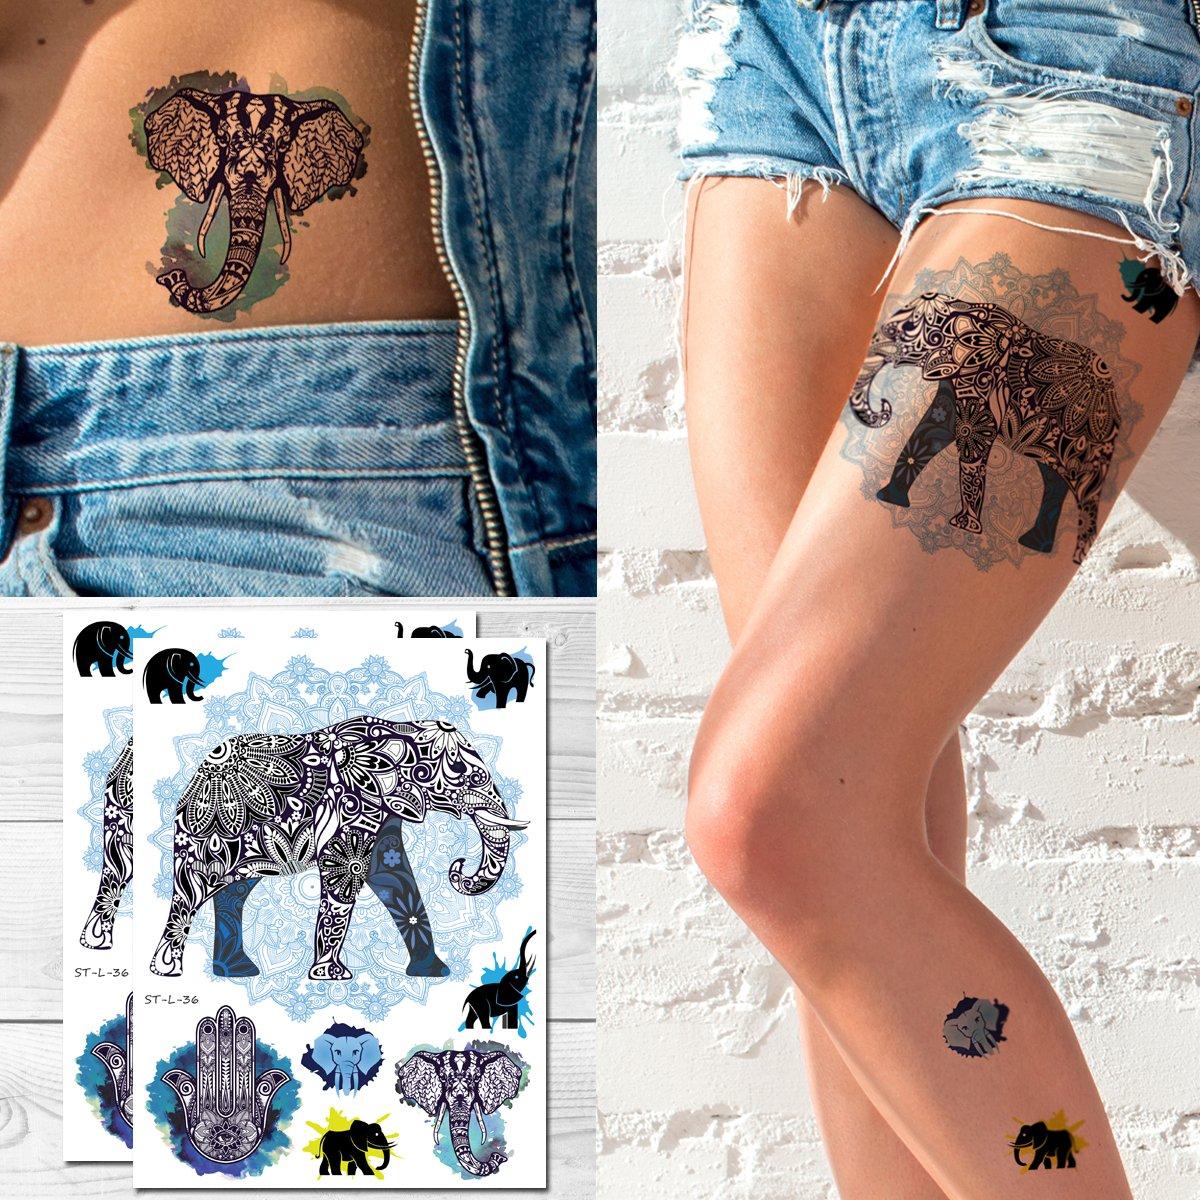 Amazon.com: supperb Tatuajes Temporales – elefante Mandala ...